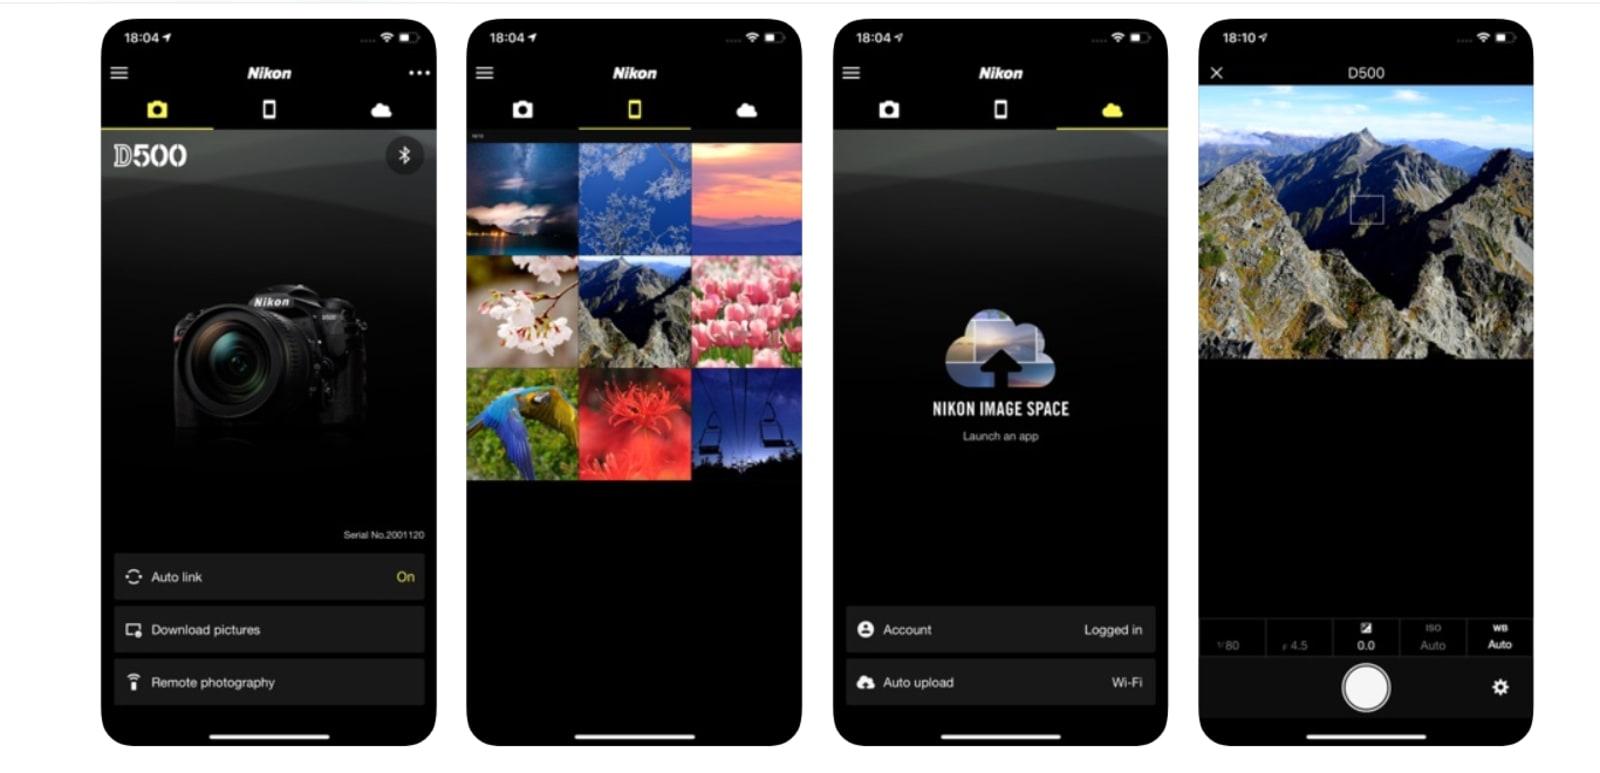 Nikon updates its SnapBridge app for faster image transfers